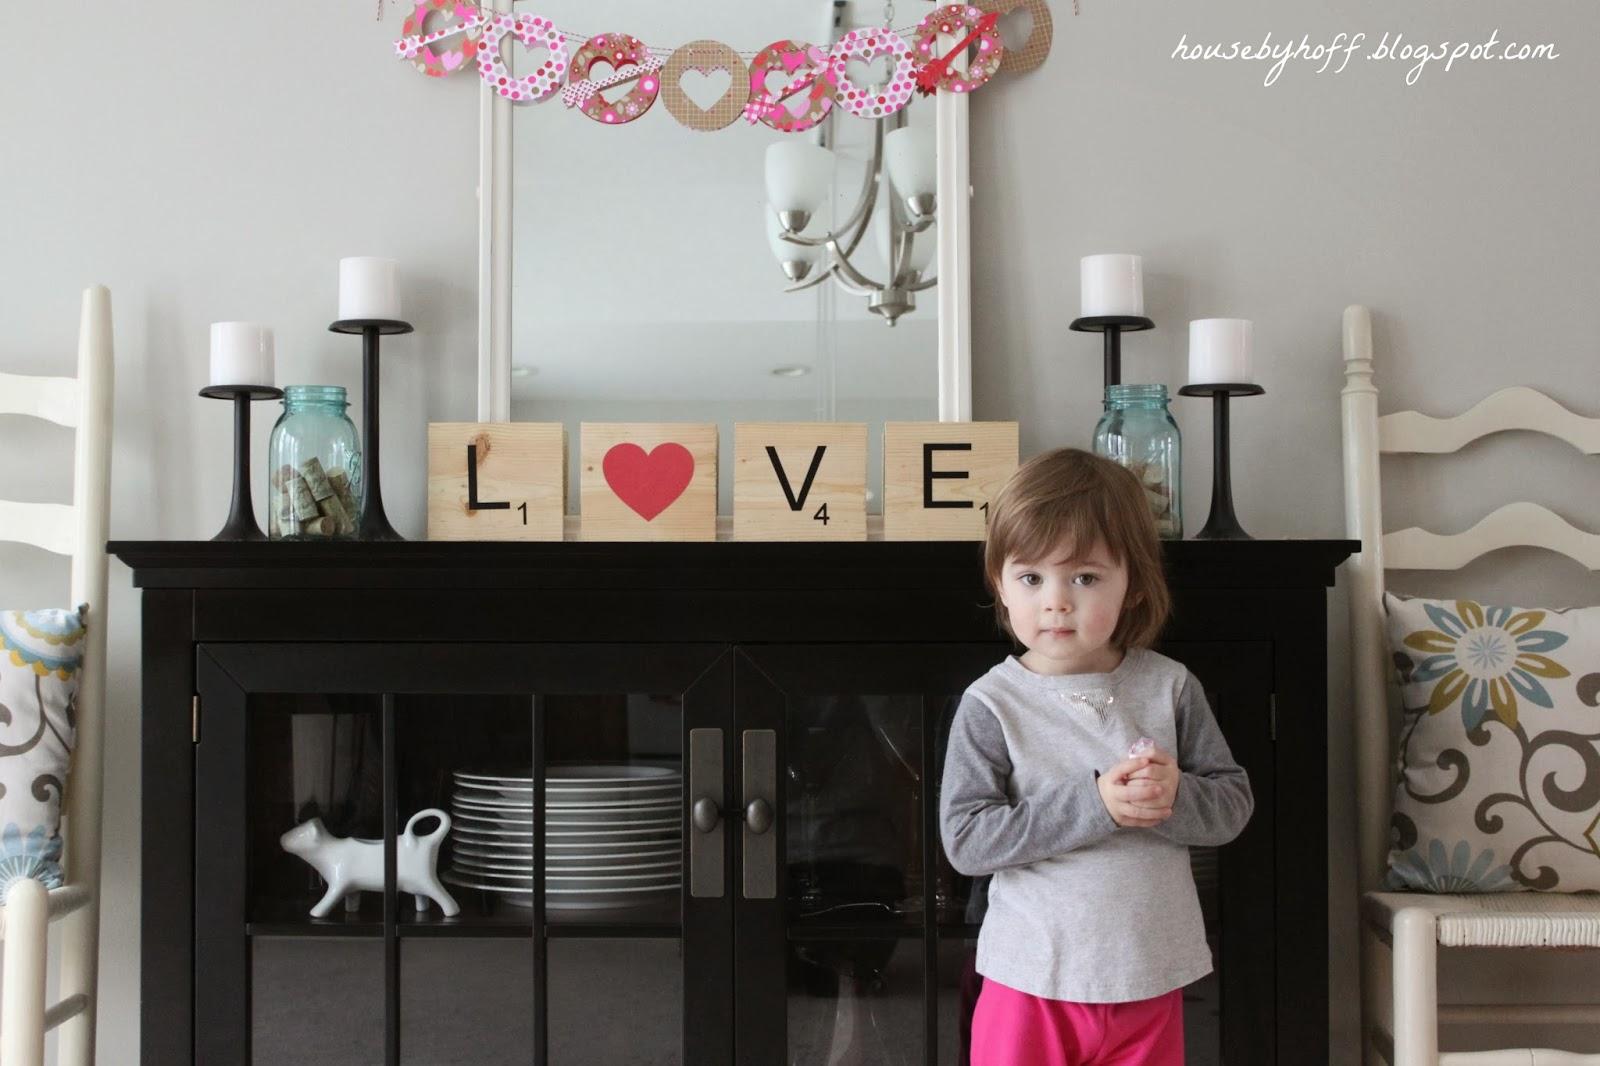 Little girl posing in front of the Love art.